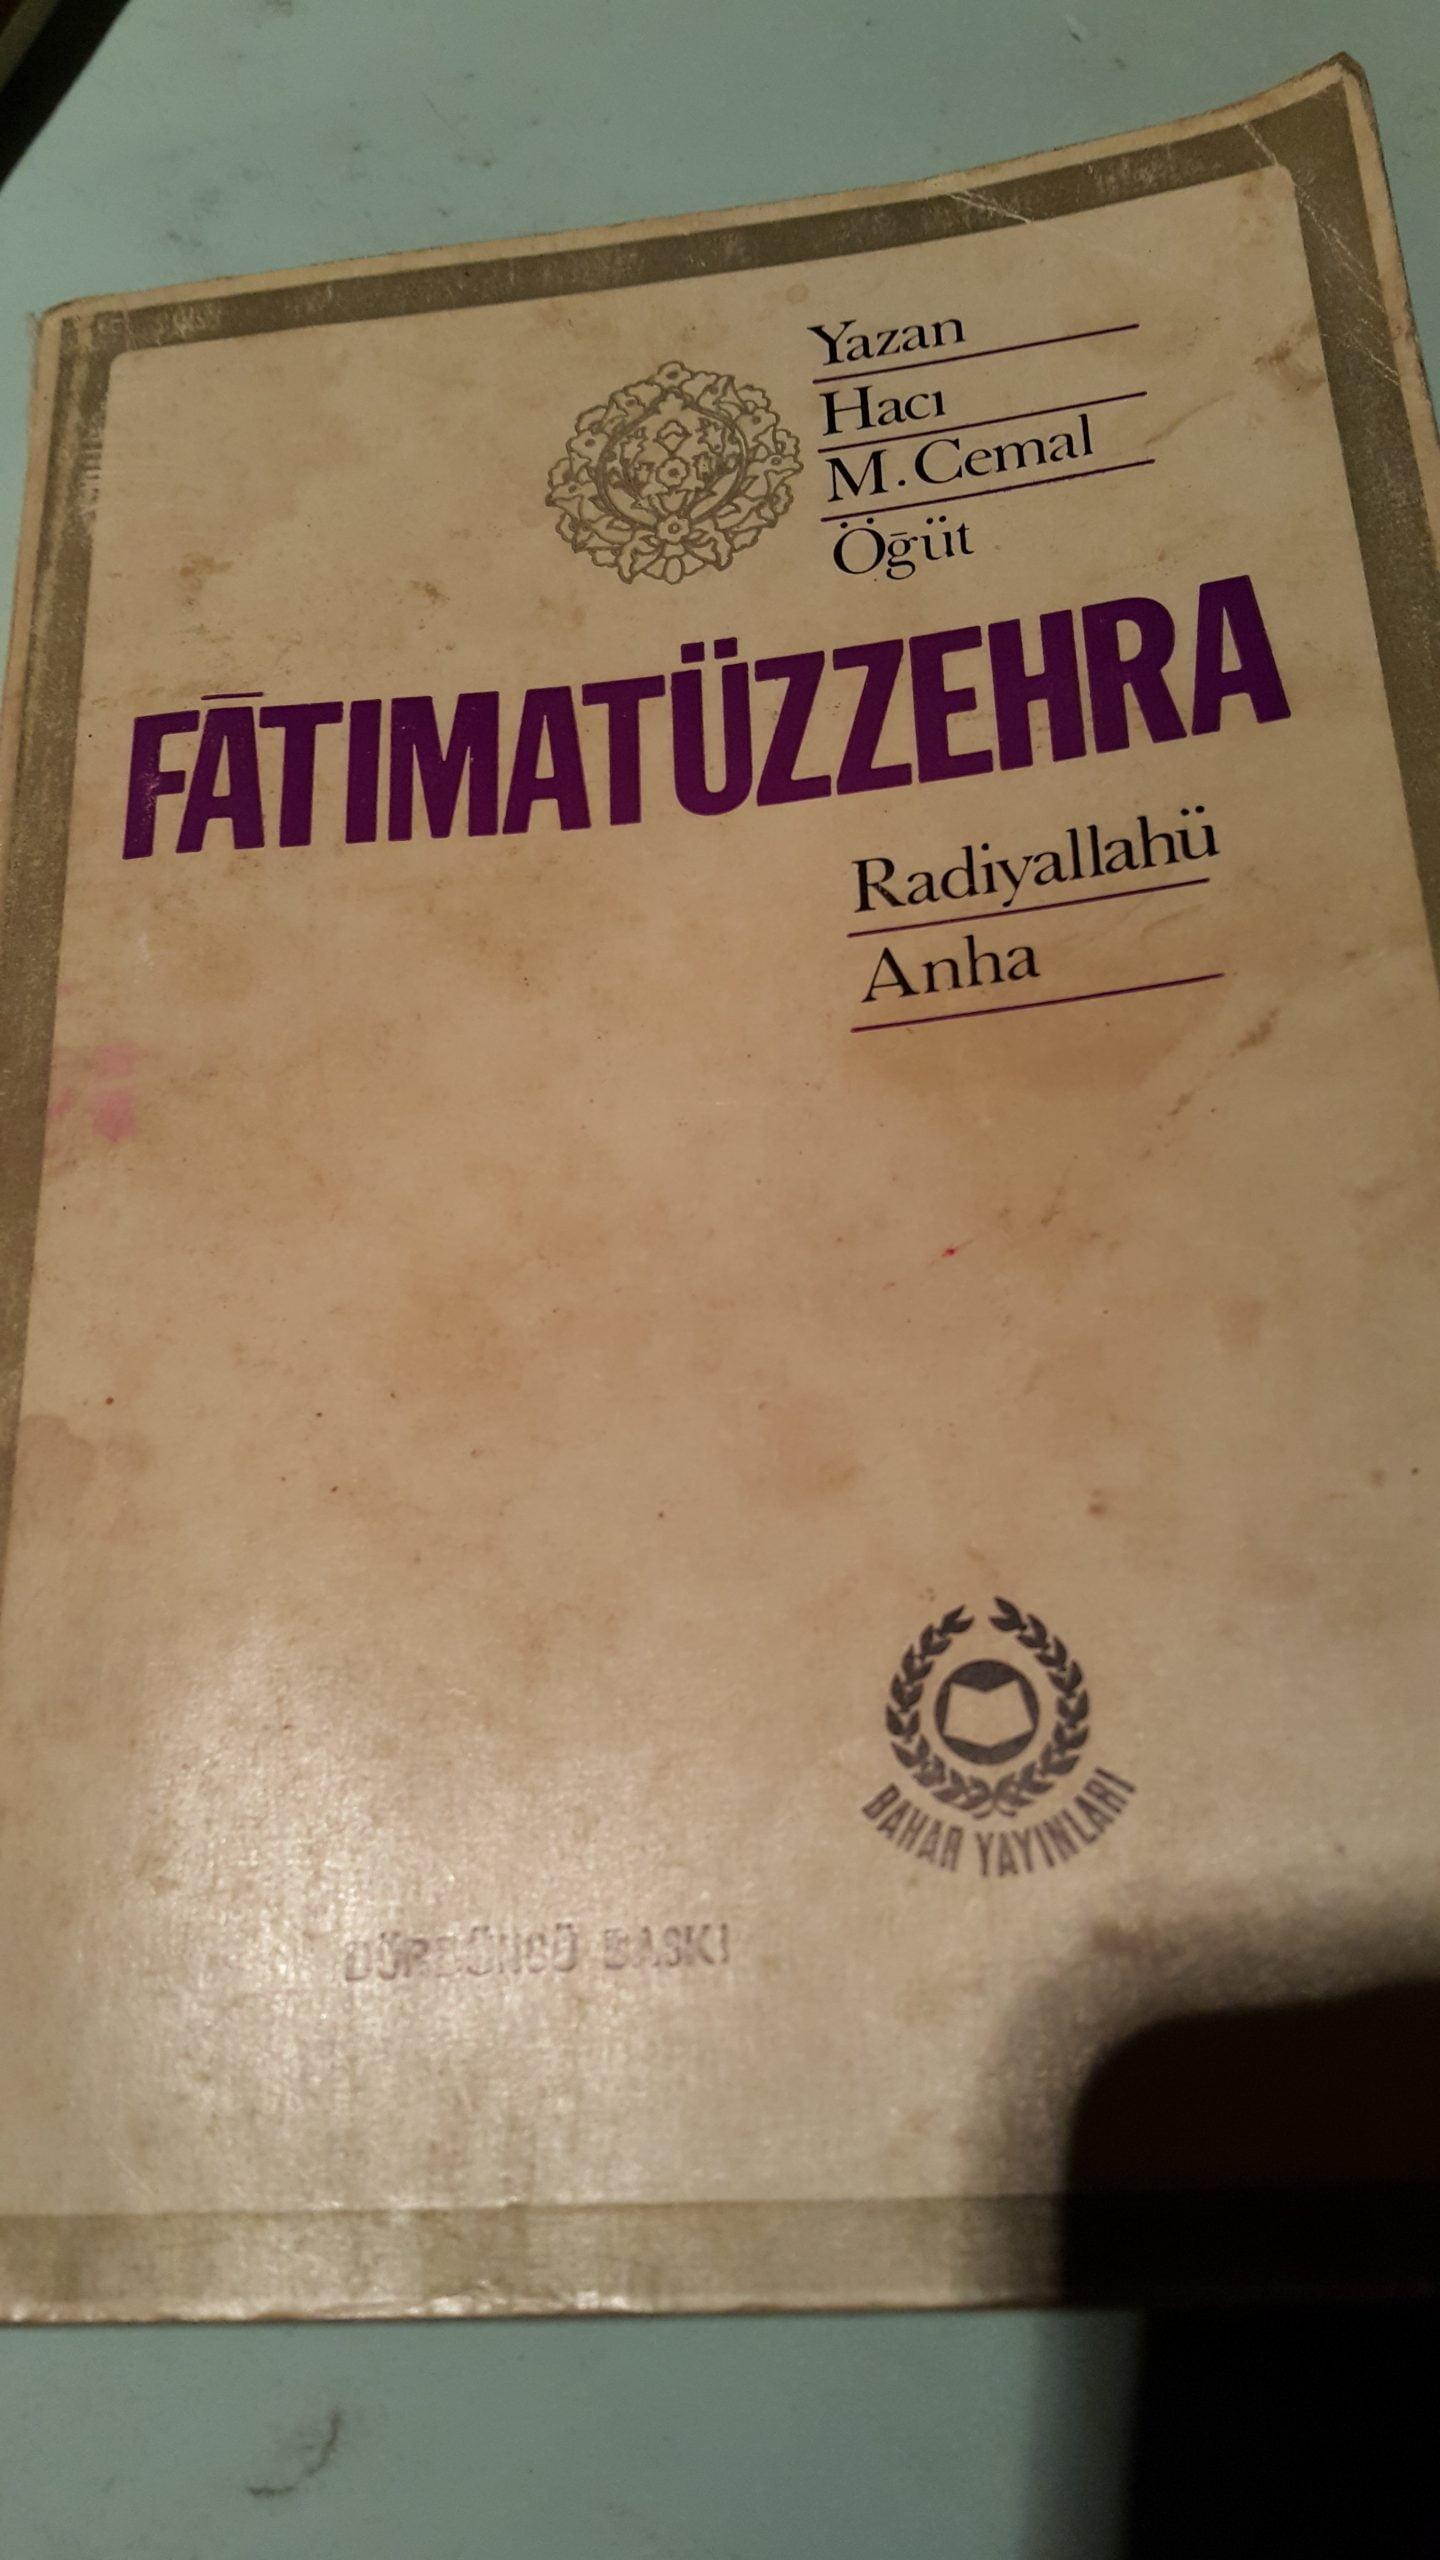 FATIMATÜZZEHRA/H.M.CEMAL ÖĞÜT